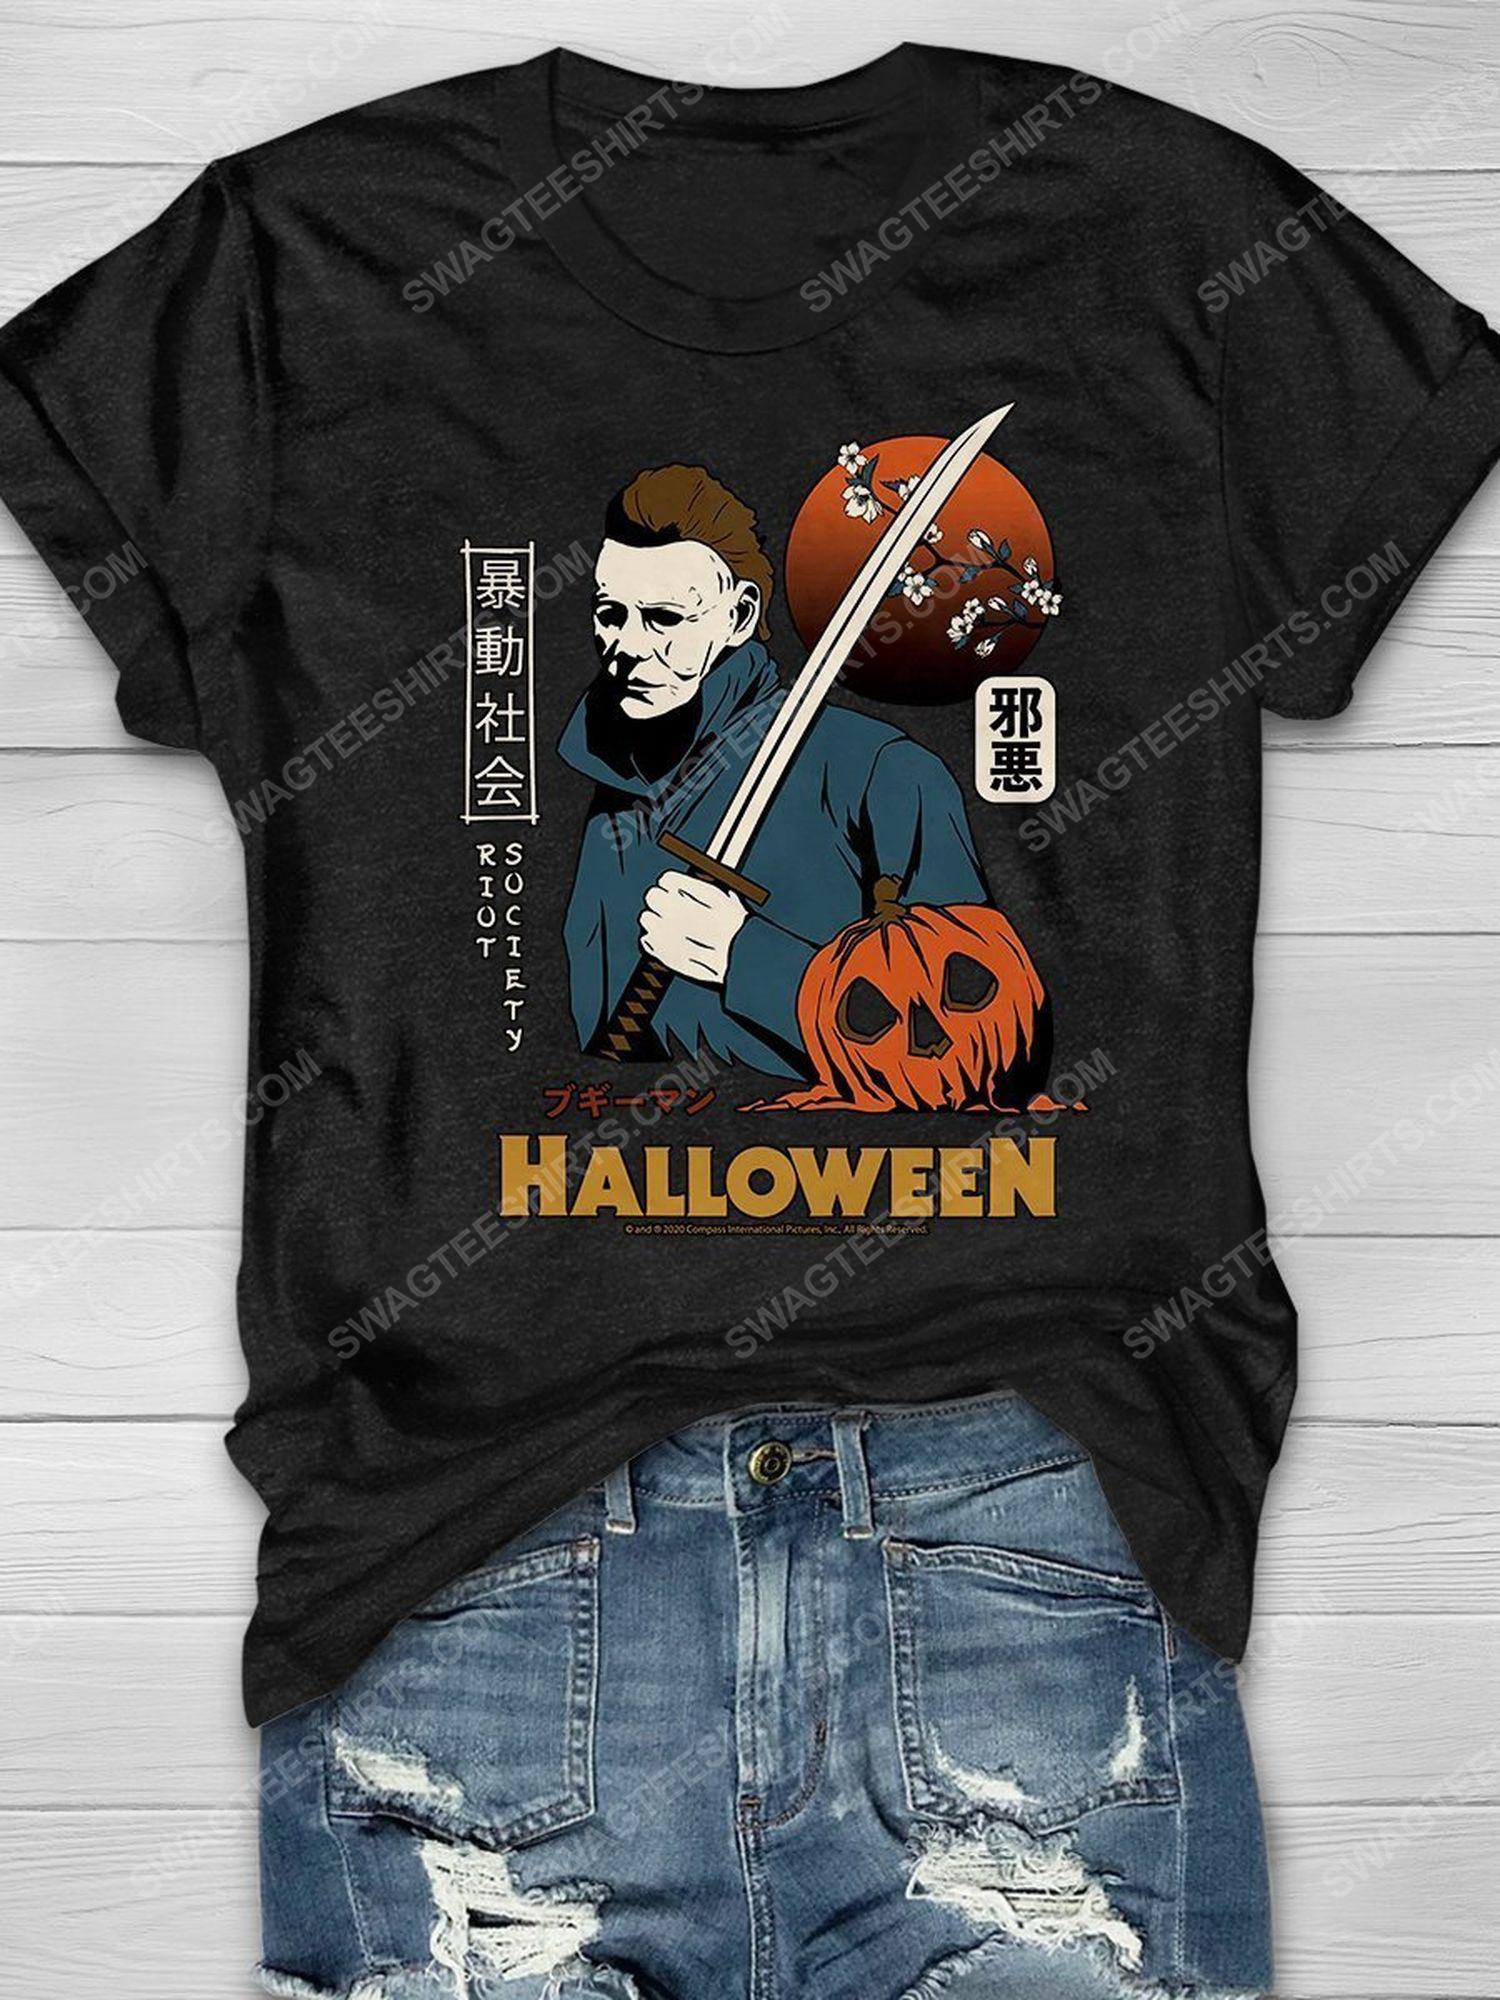 Halloween Michael myers with katana shirt 1 - Copy (3)